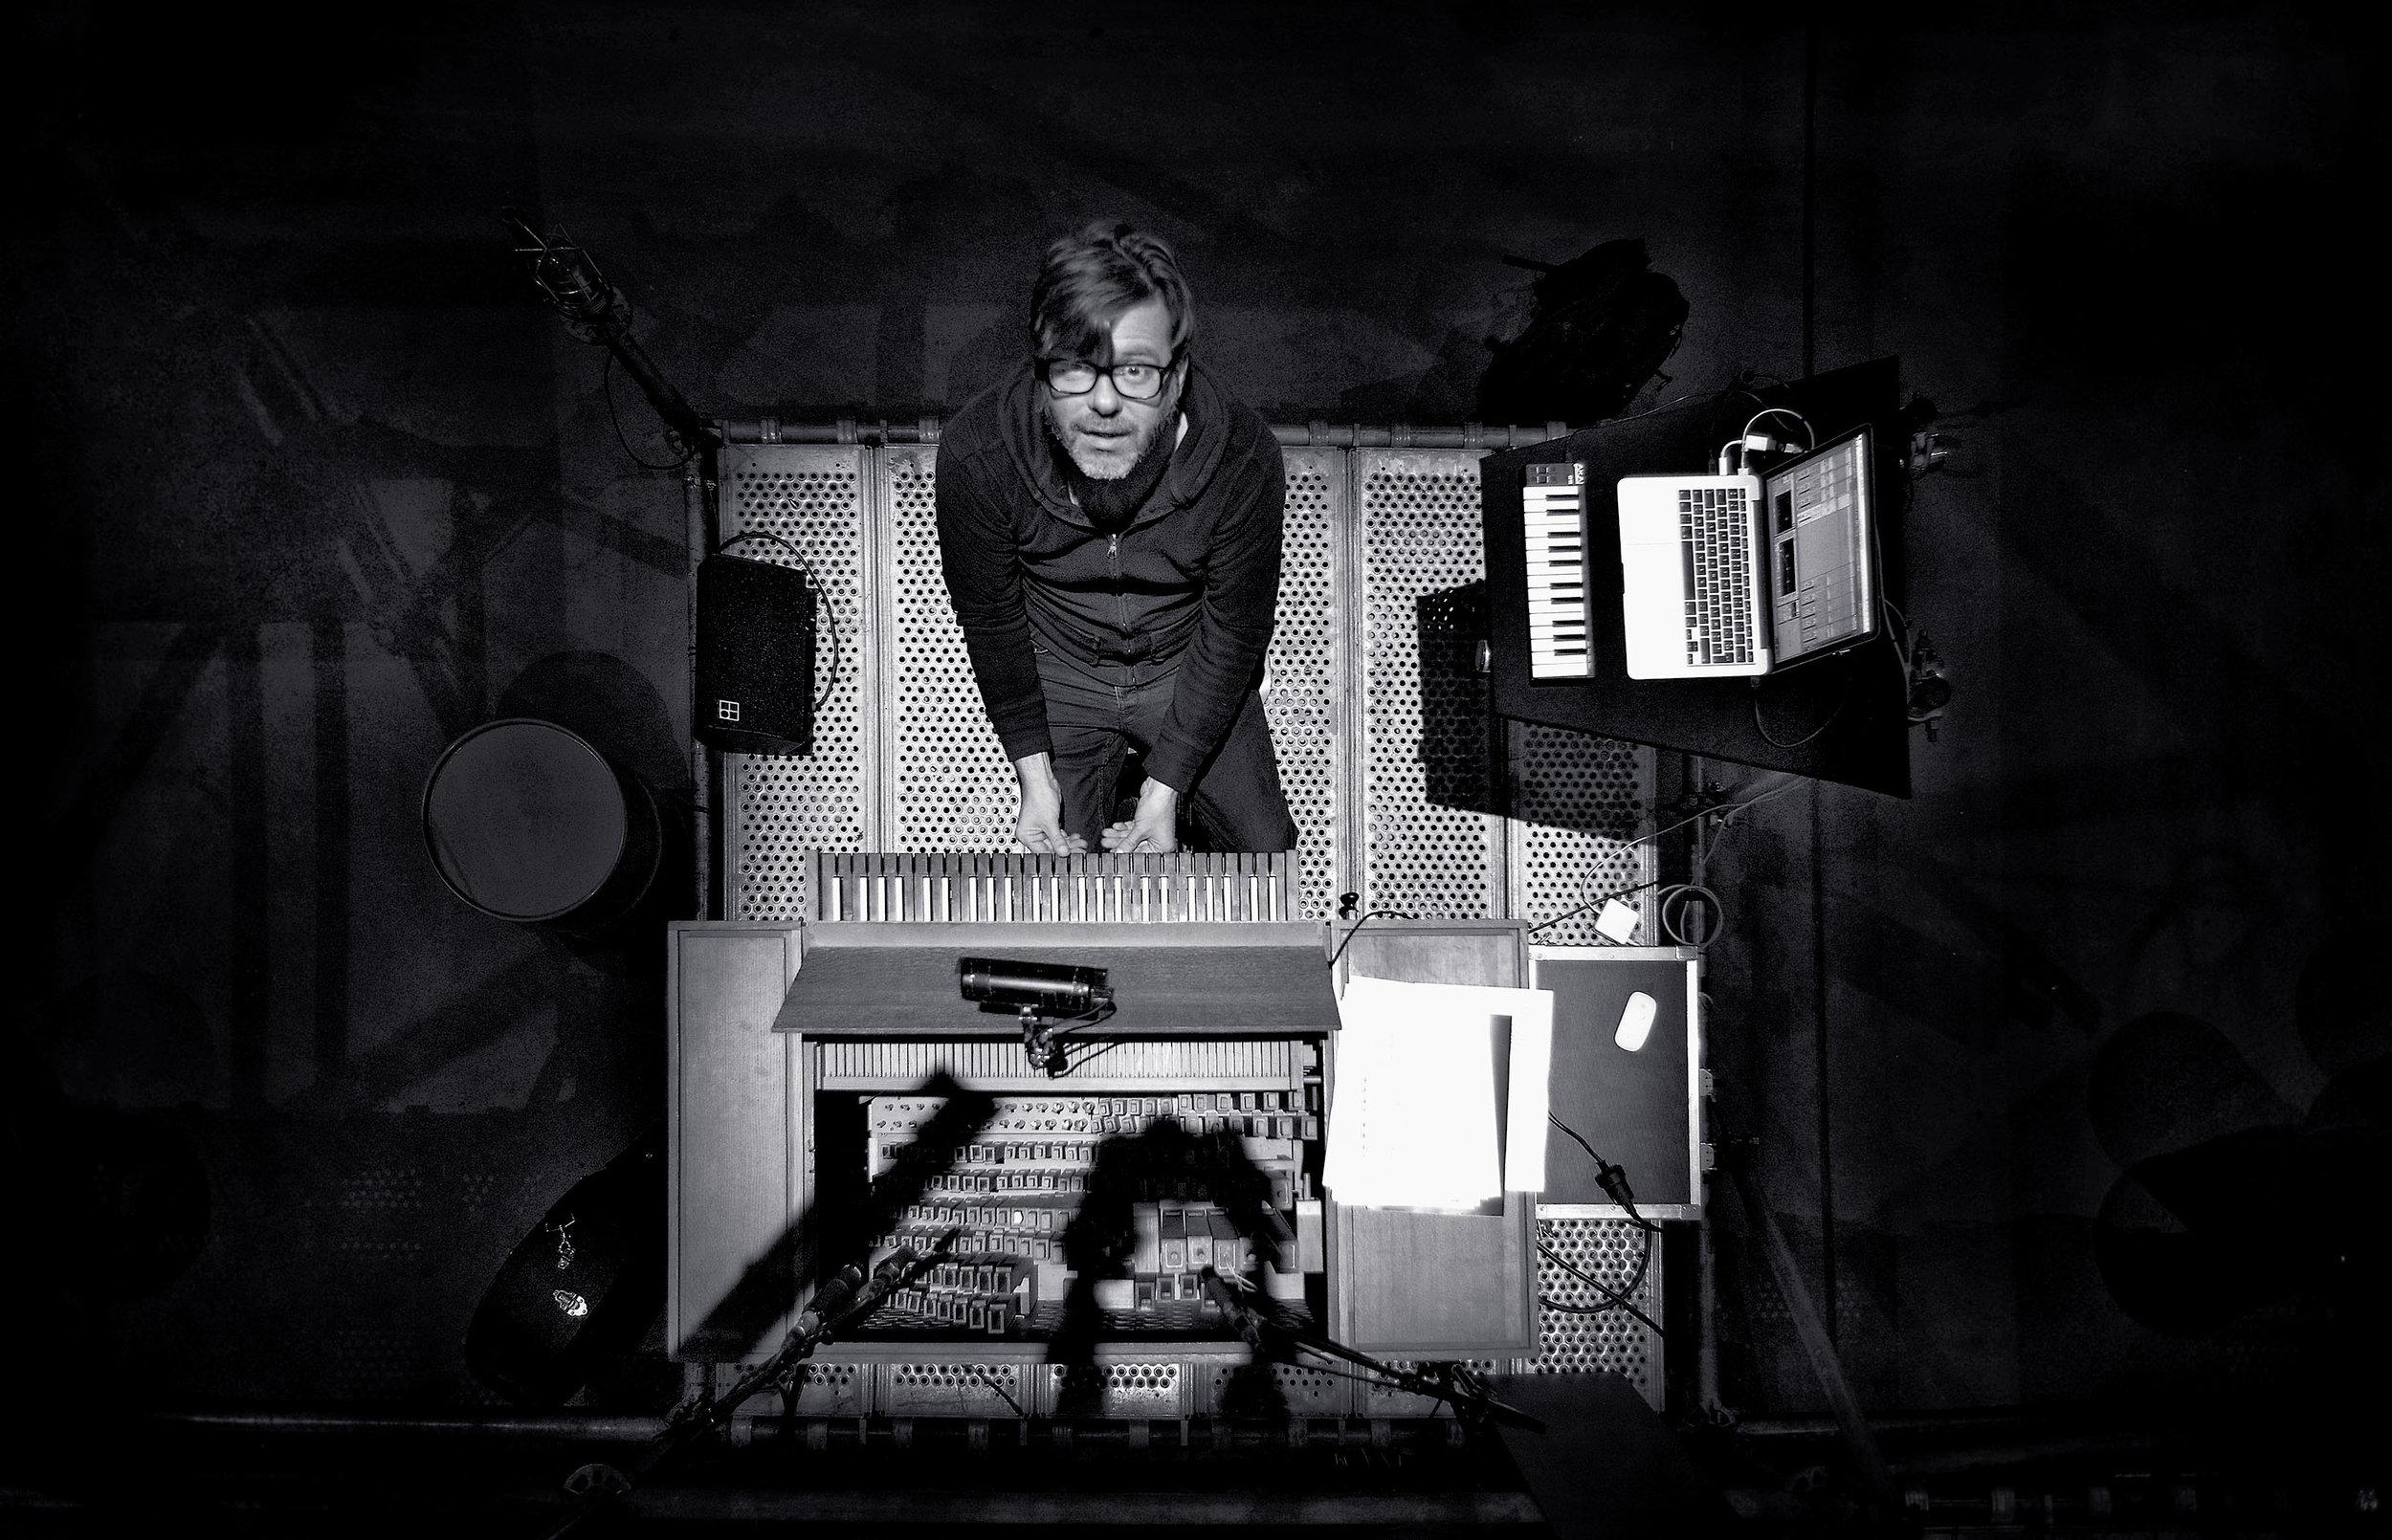 picture @ Wim Catrysse